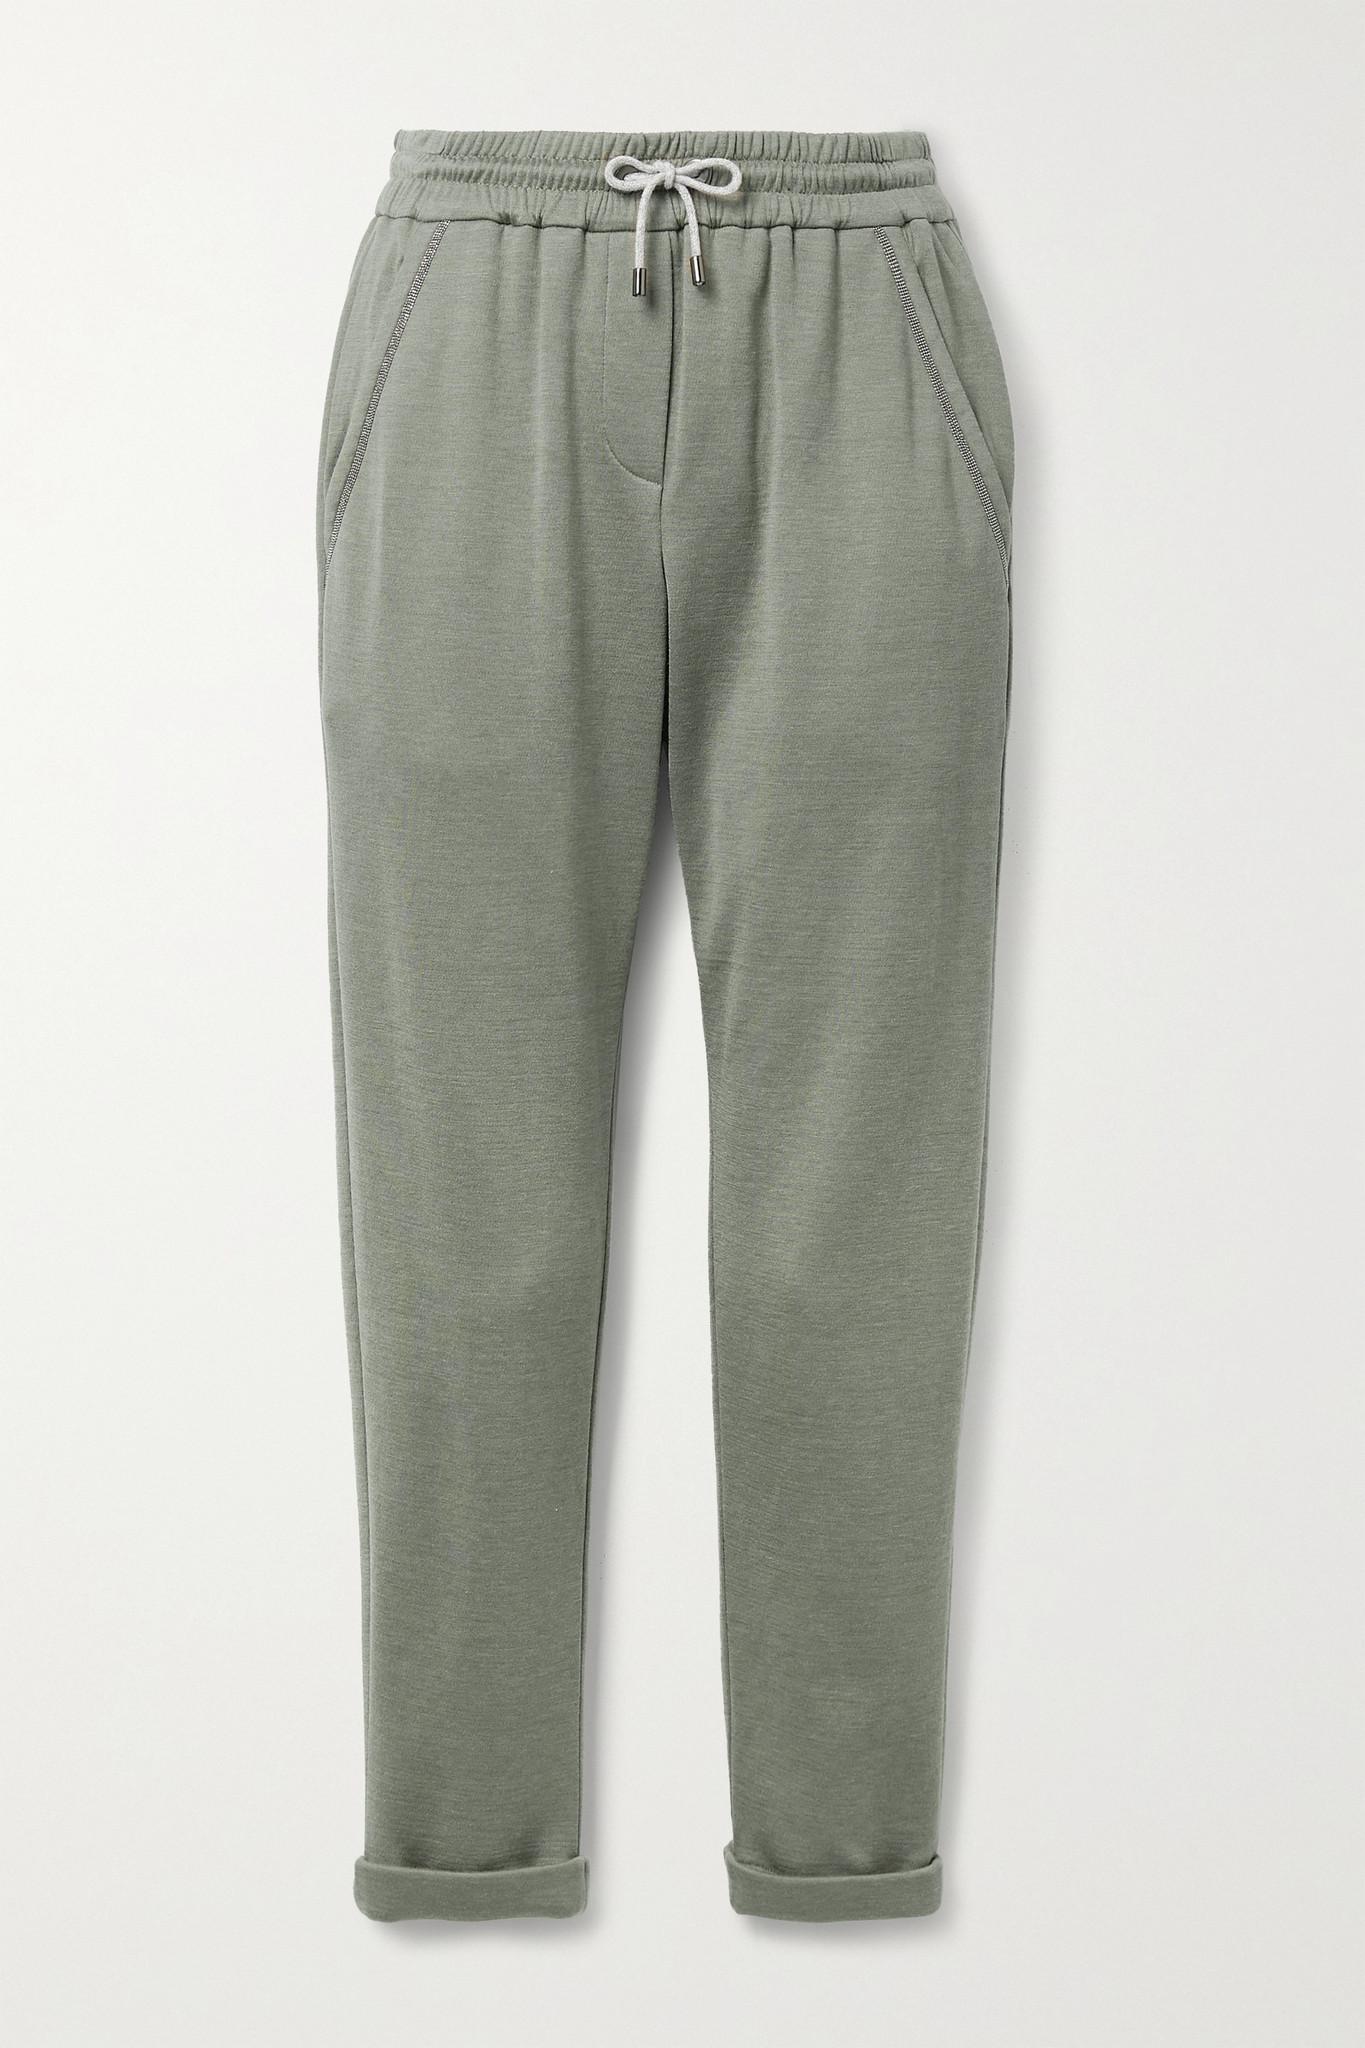 BRUNELLO CUCINELLI - 珠饰棉质混纺平纹布休闲裤 - 绿色 - x small